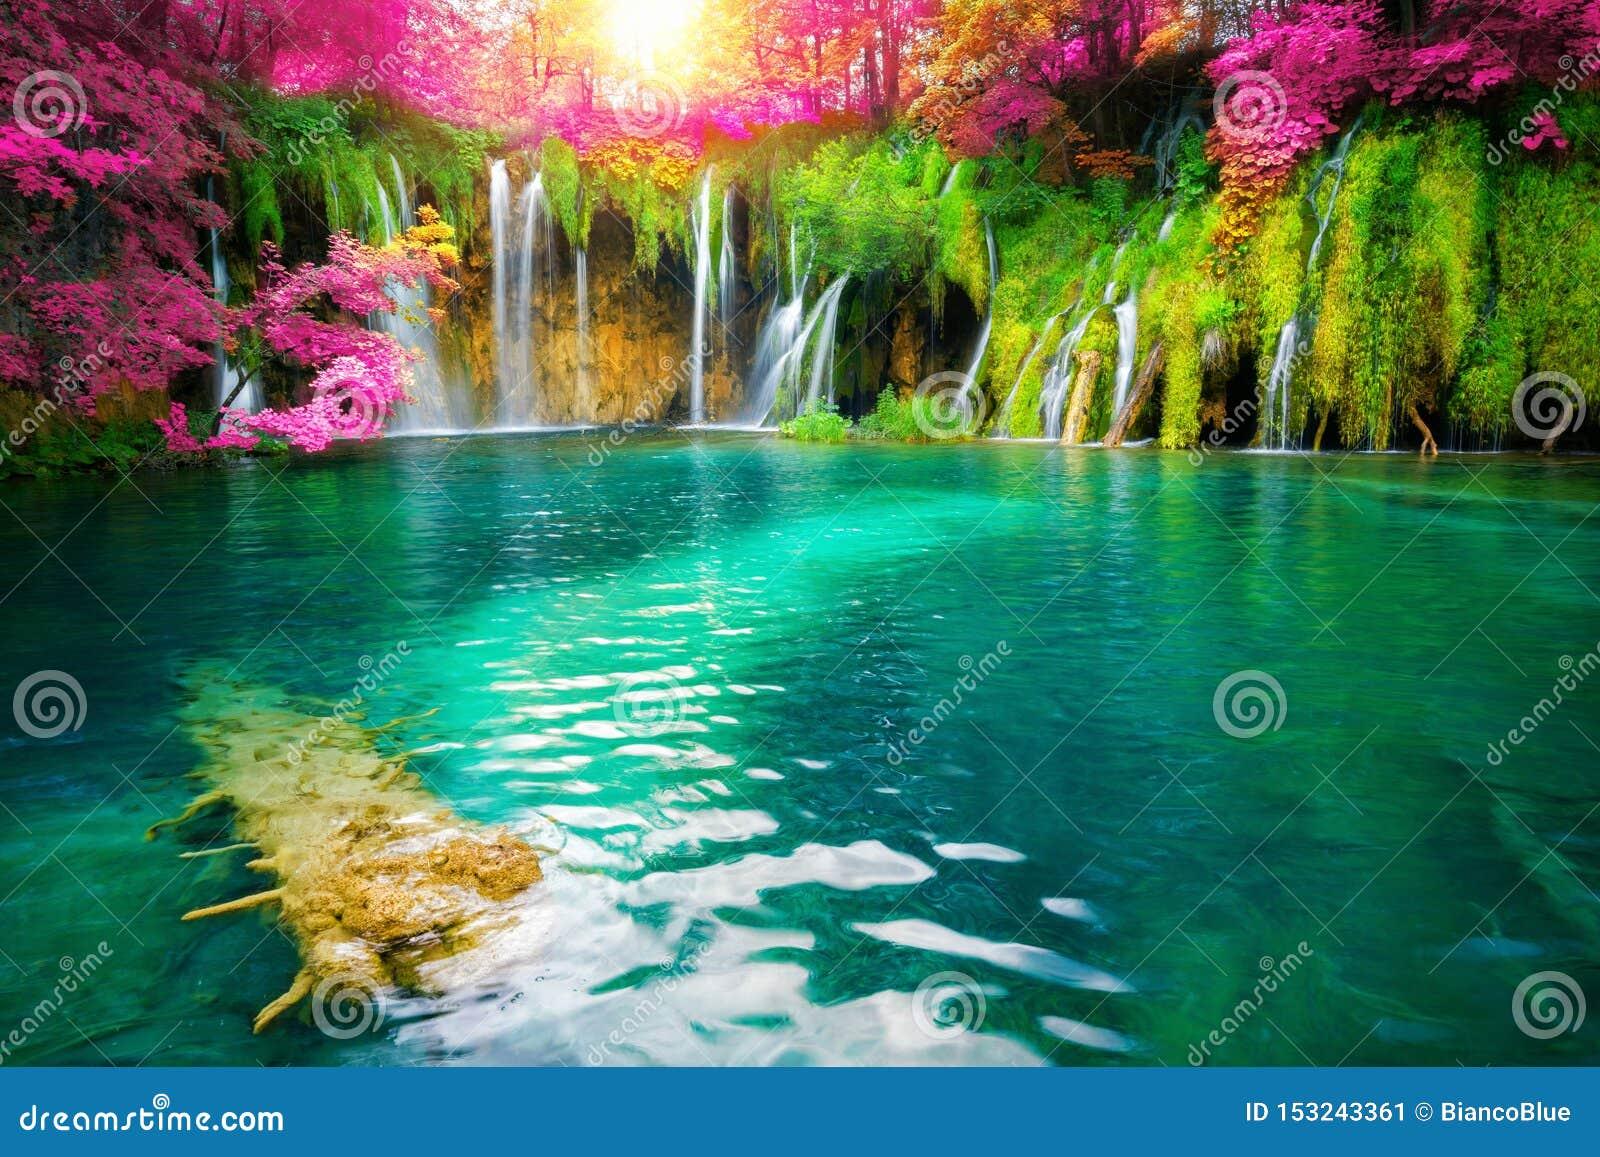 Plitvice湖克罗地亚瀑布风景